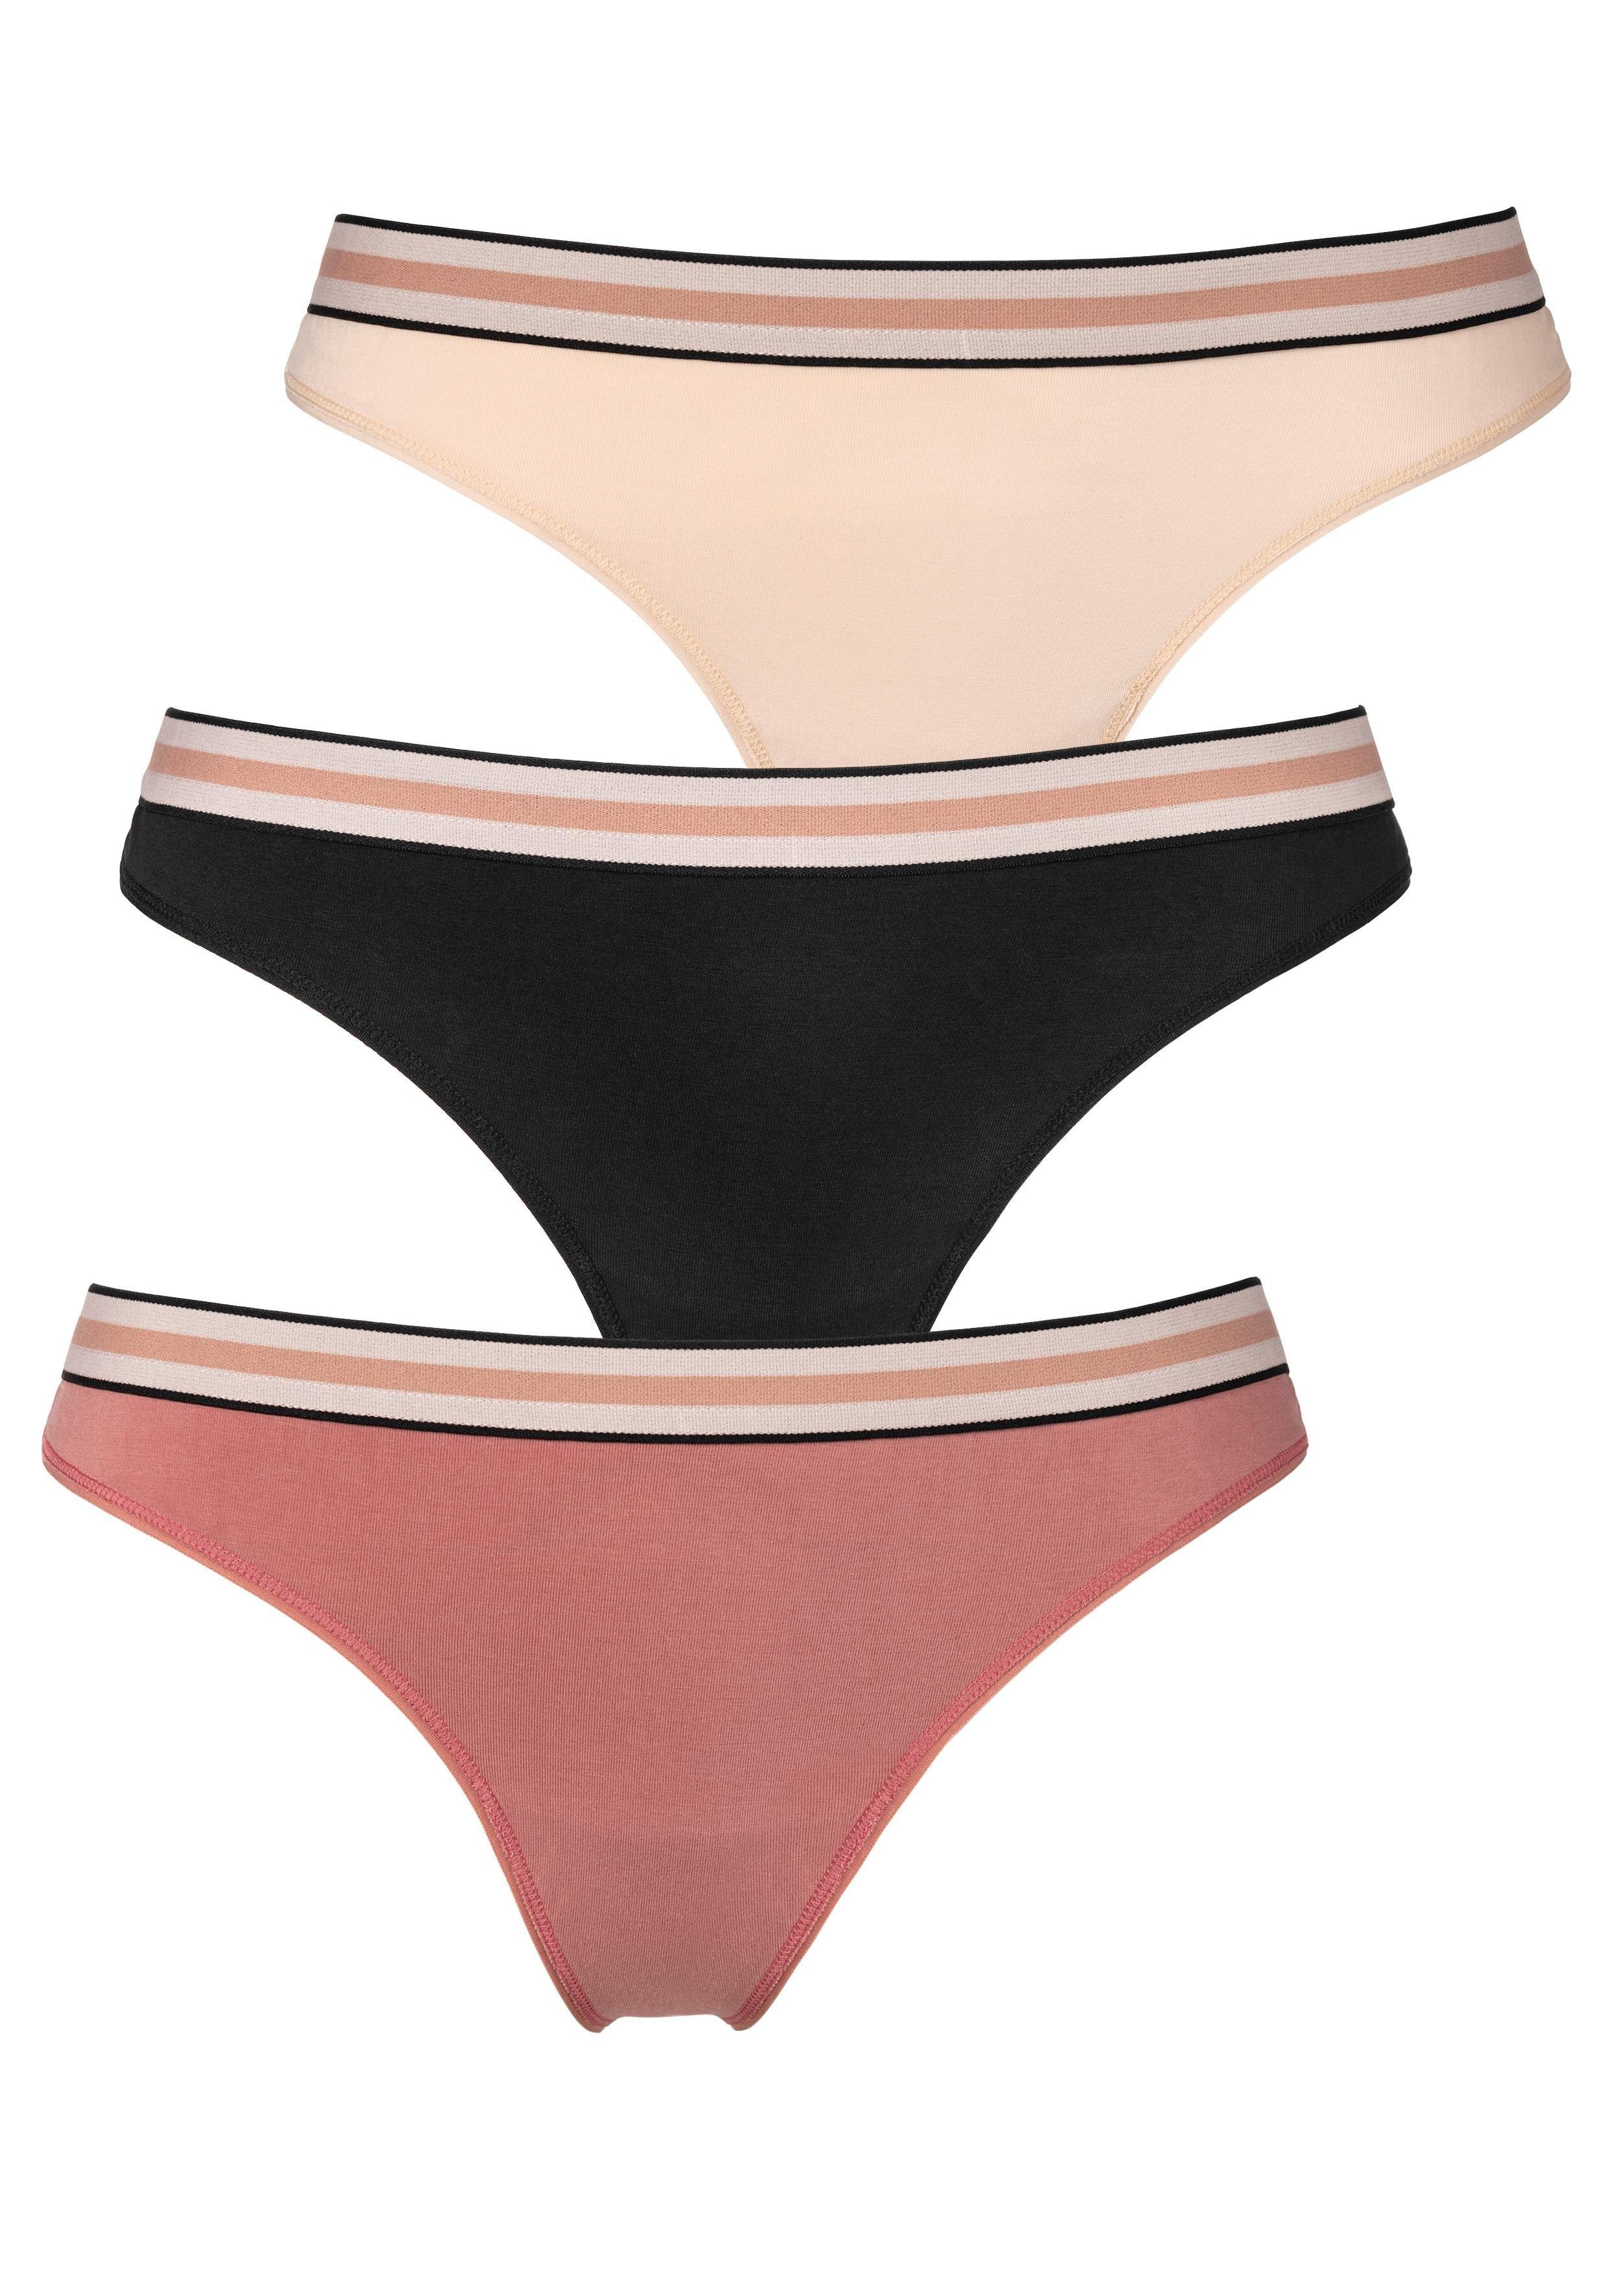 s.Oliver Bodywear s.Oliver RED LABEL Bodywear string (set van 3) met kanten band goedkoop op lascana.nl kopen